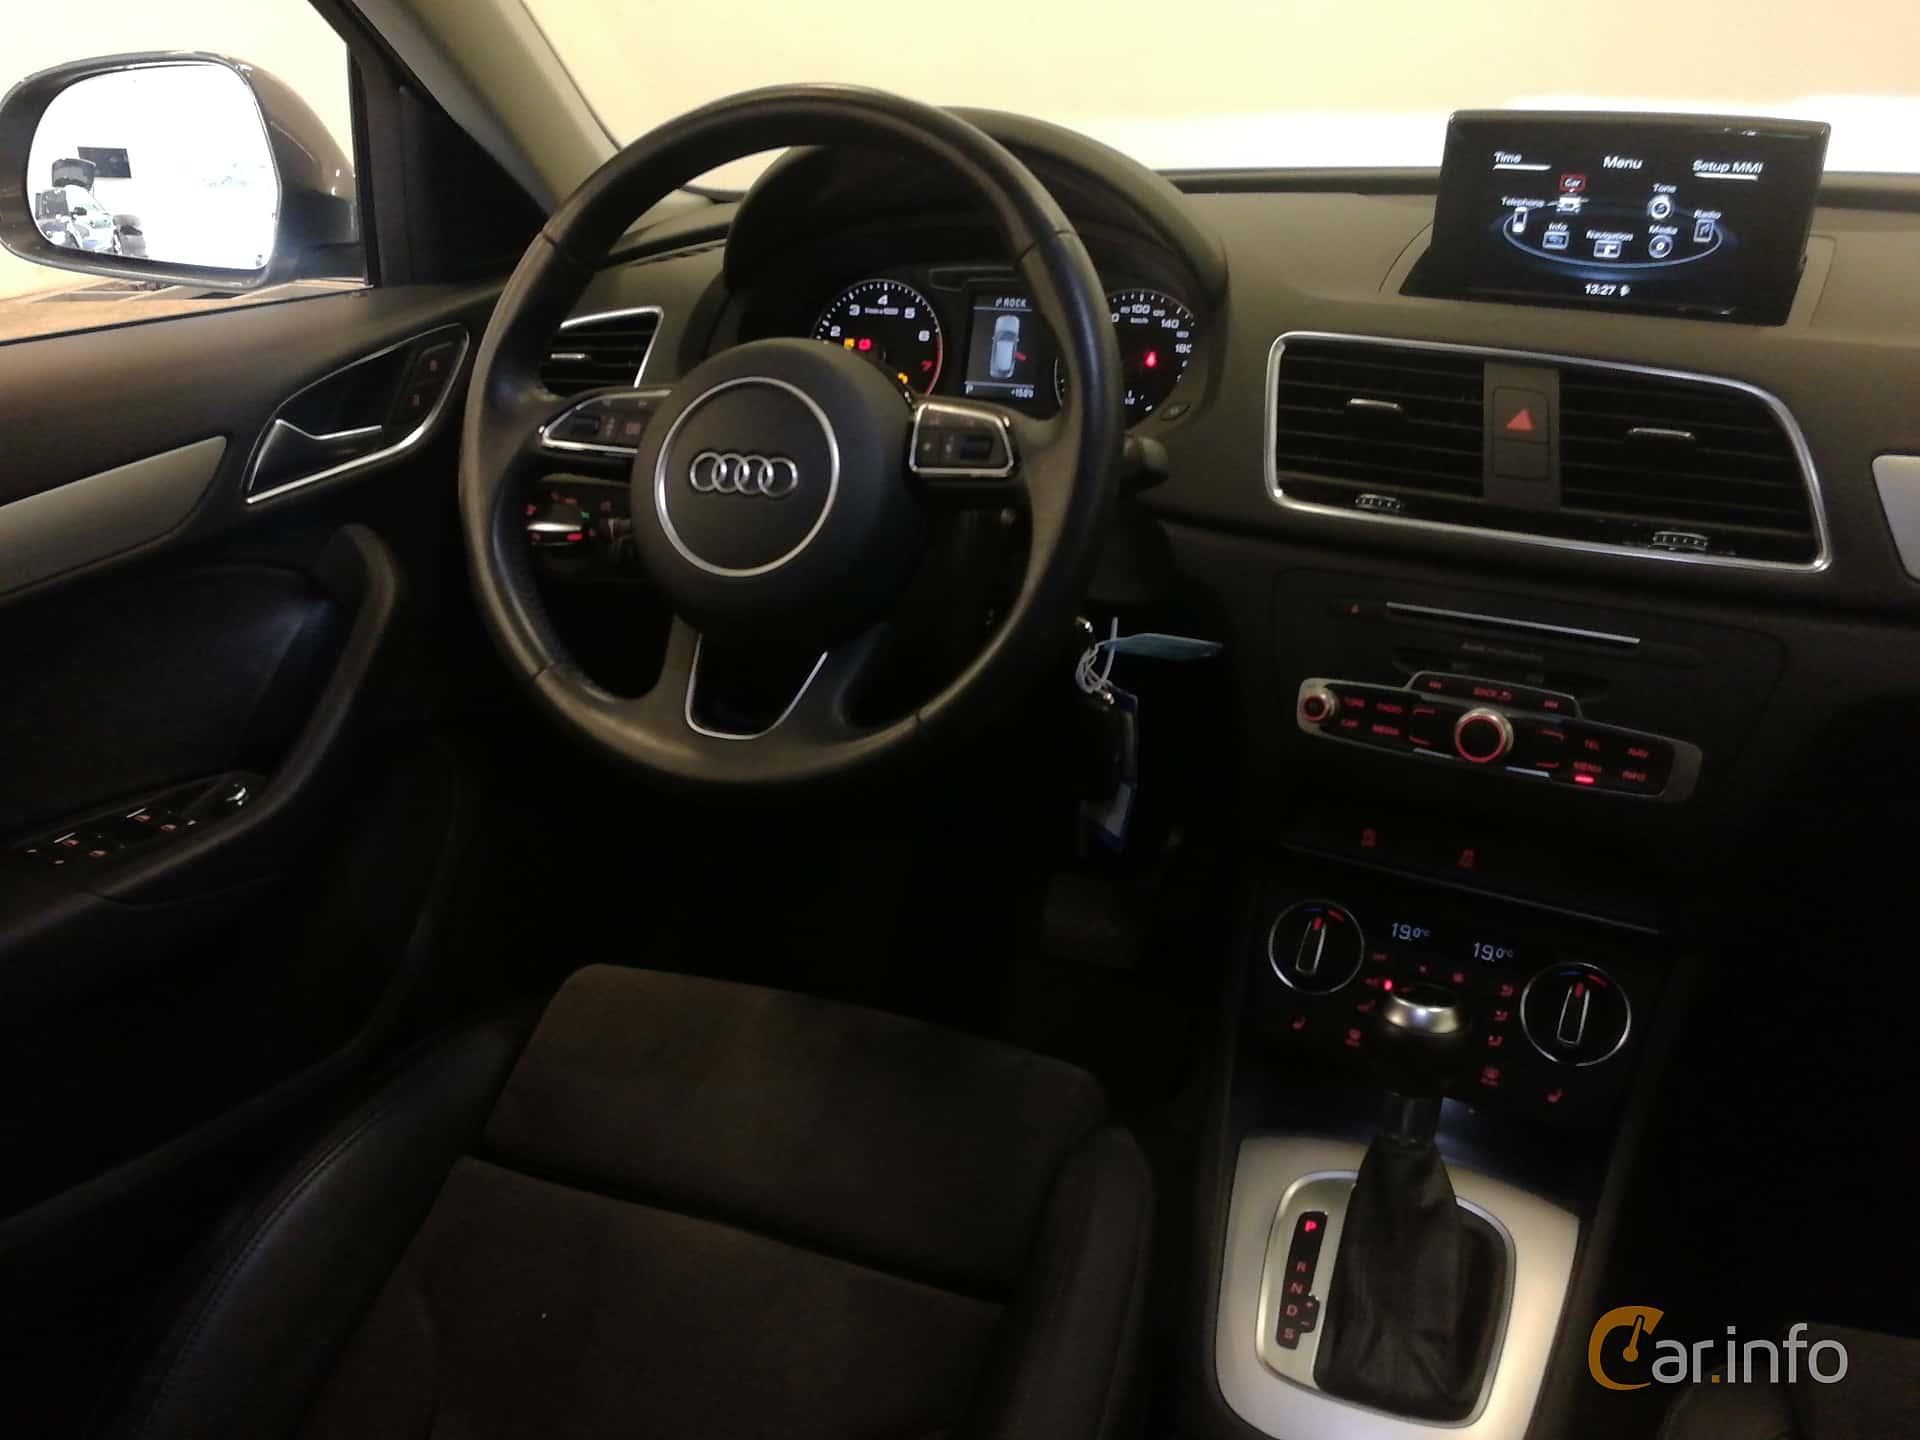 Audi Q3 2.0 TFSI quattro S Tronic, 180hp, 2016